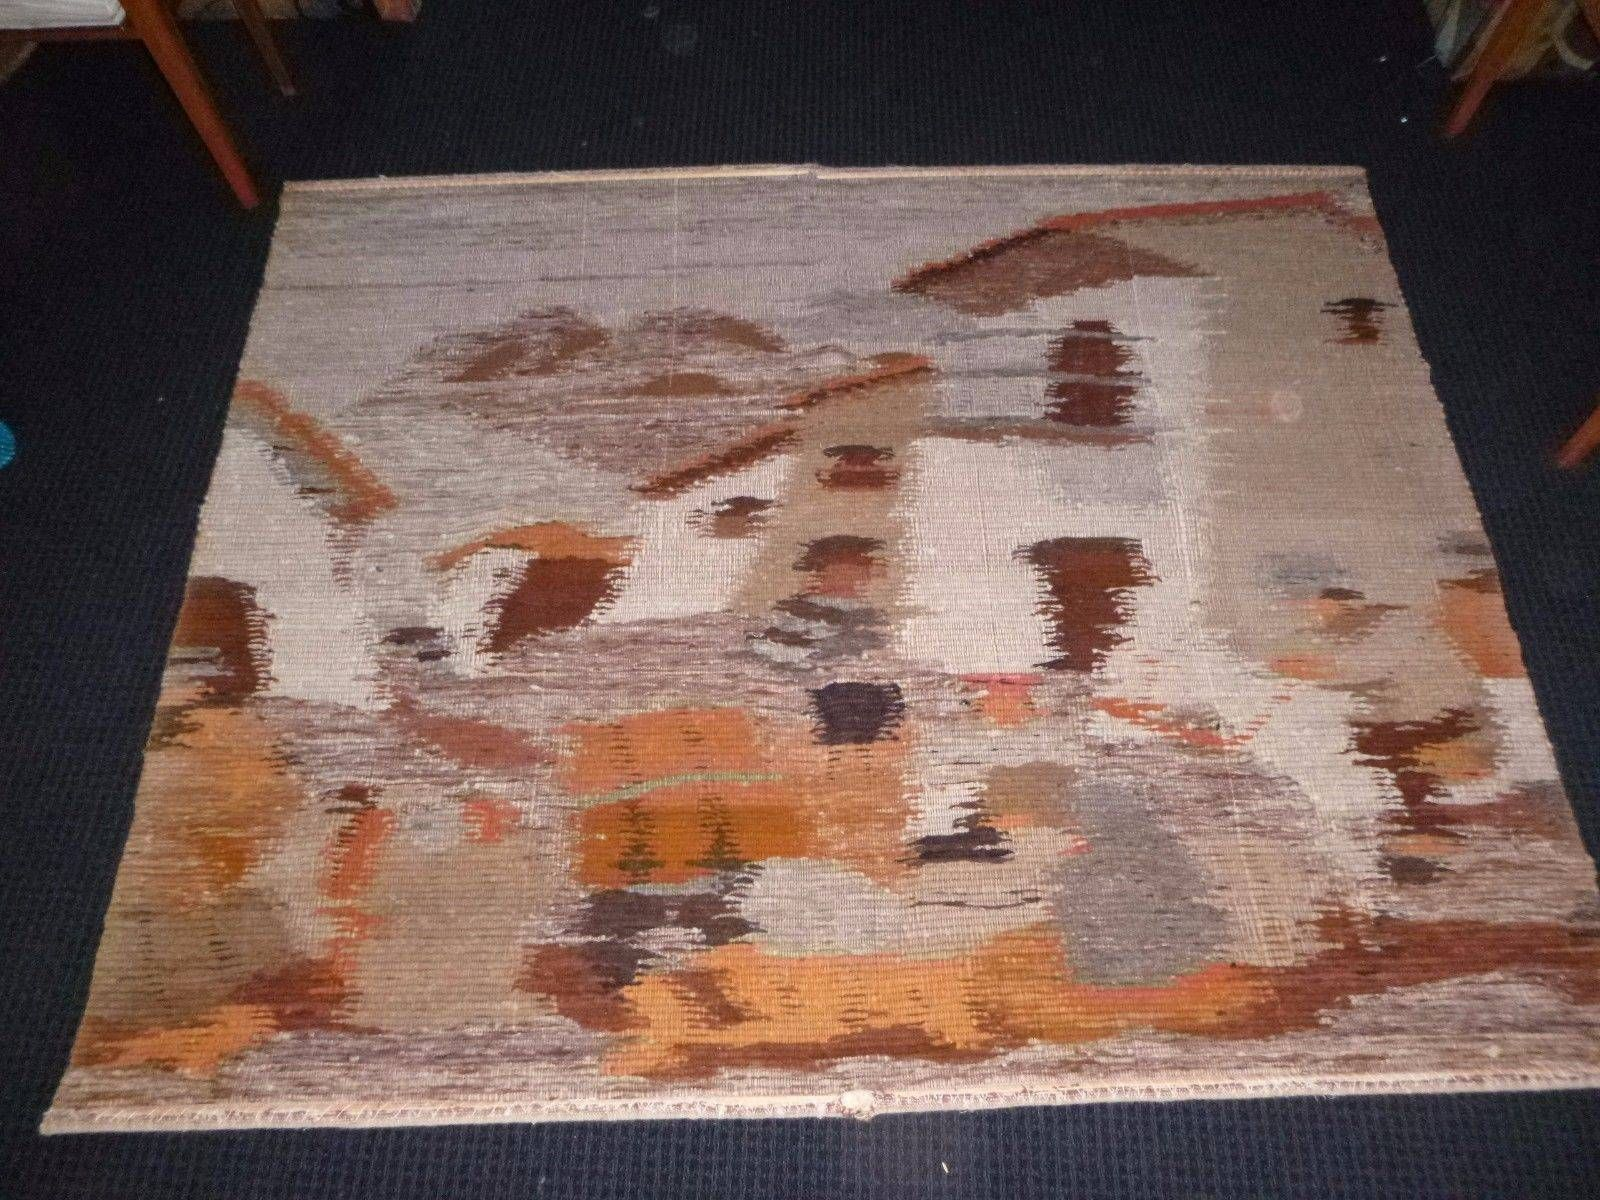 Cool vtg mid century s textured fiber textile wall artwork hanging